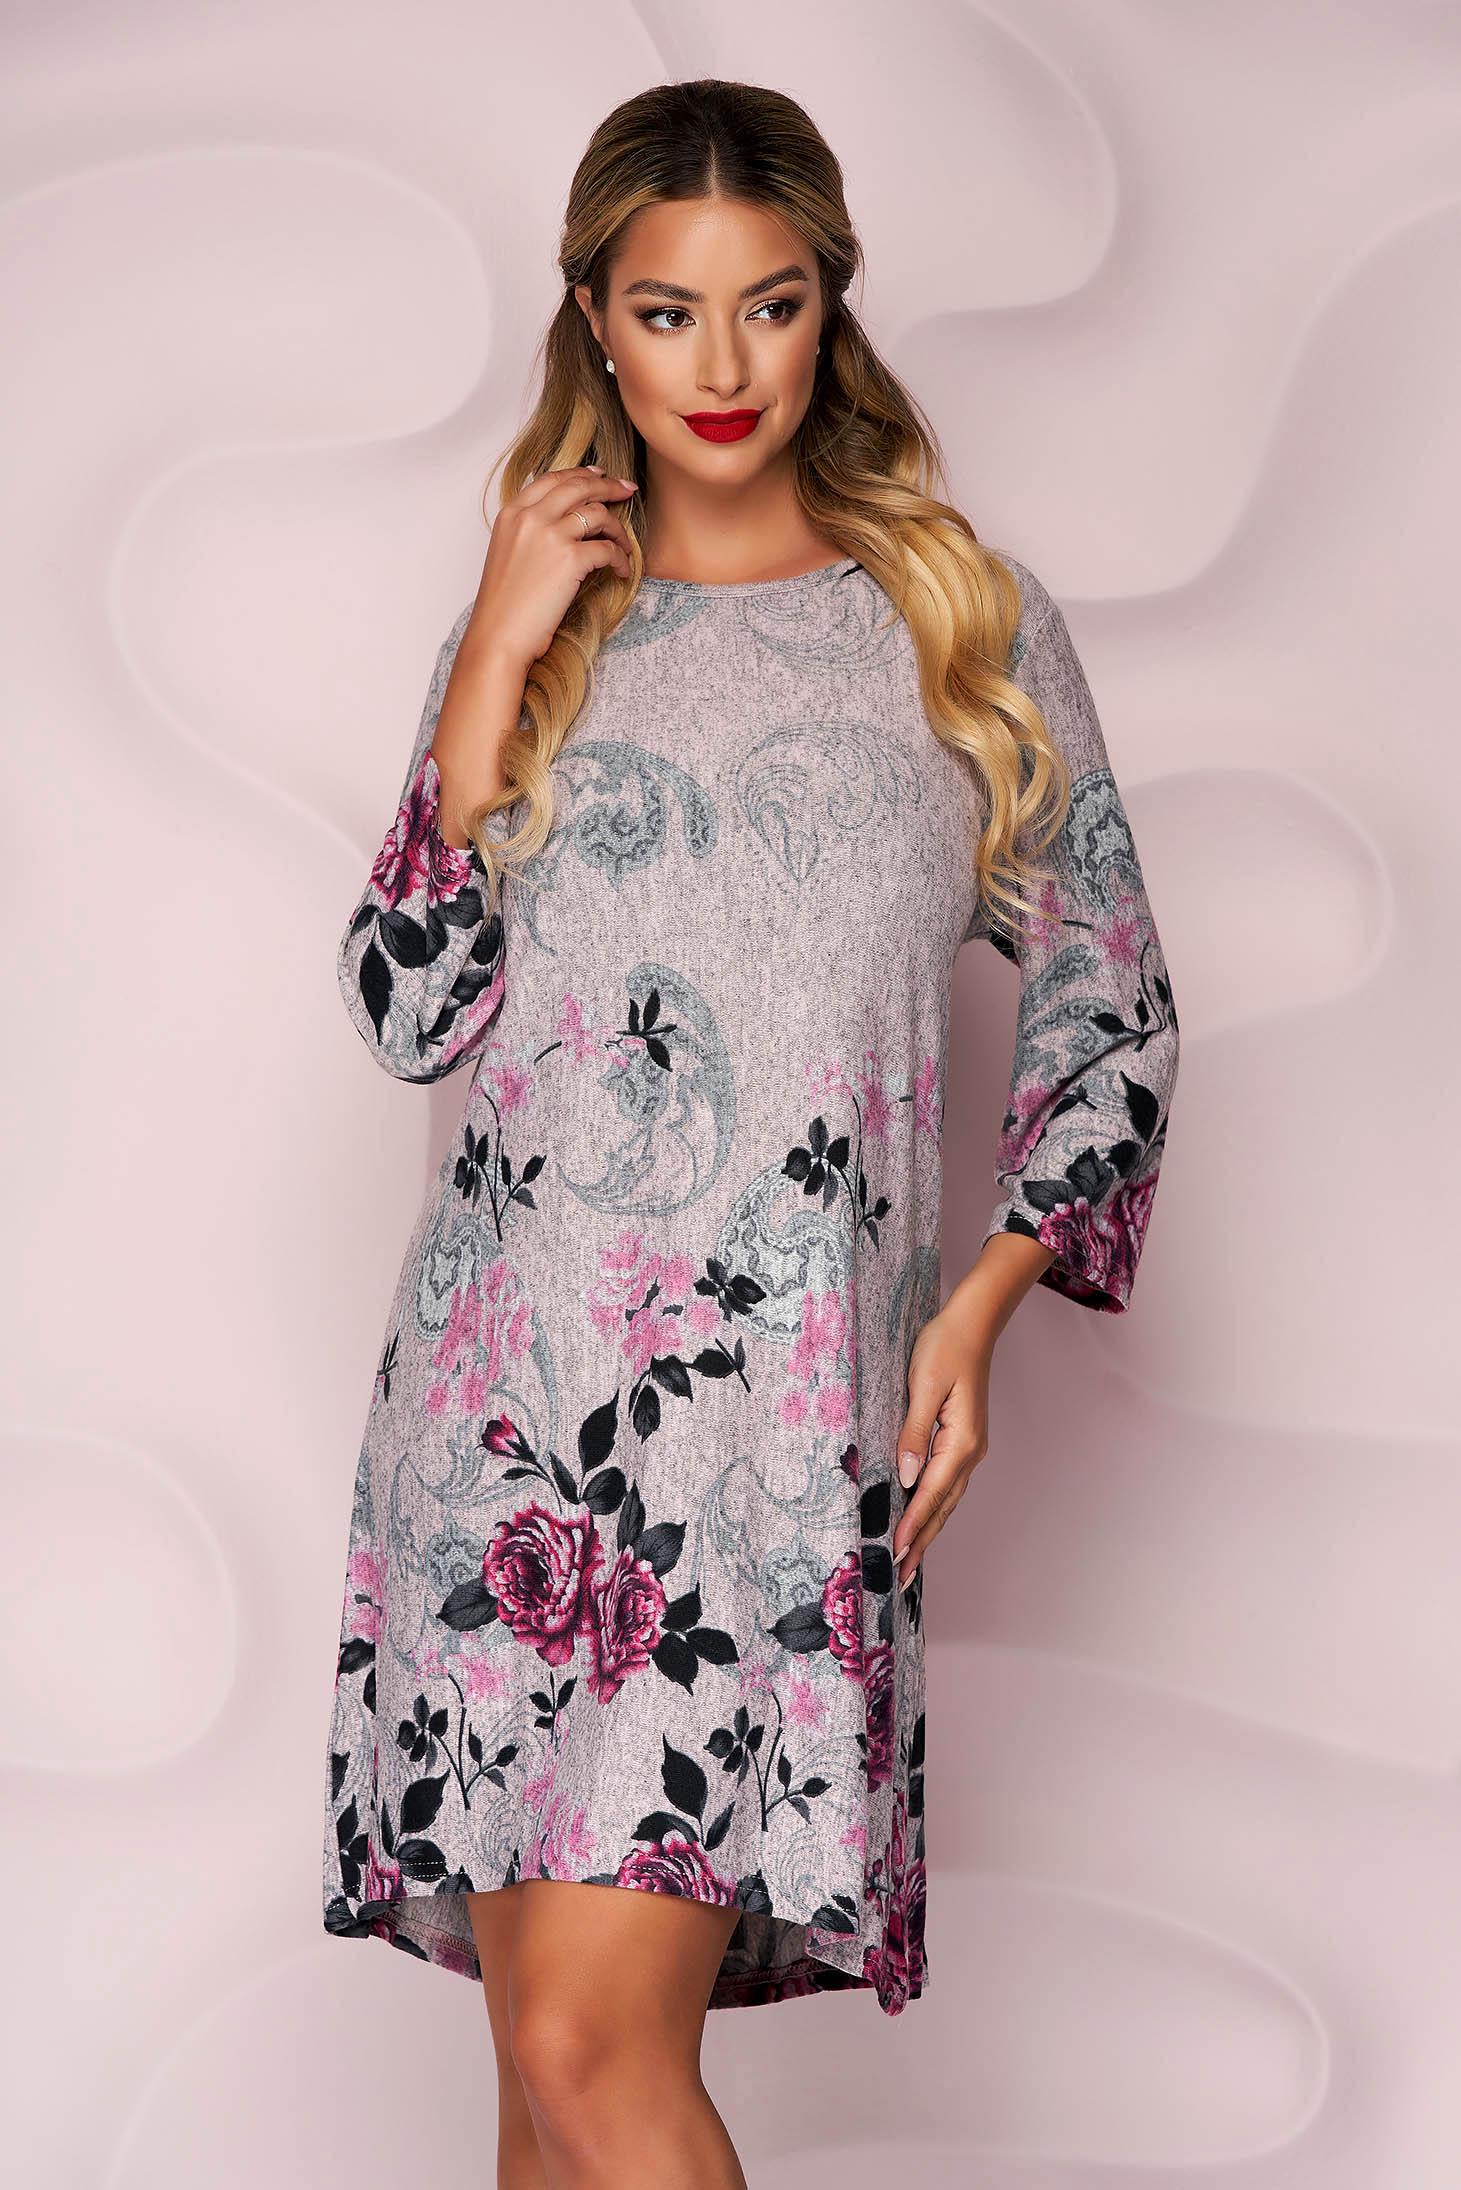 Rochie Lady Pandora roz prafuit din tricot subtire si elastic cu un croi drept si imprimeu floral